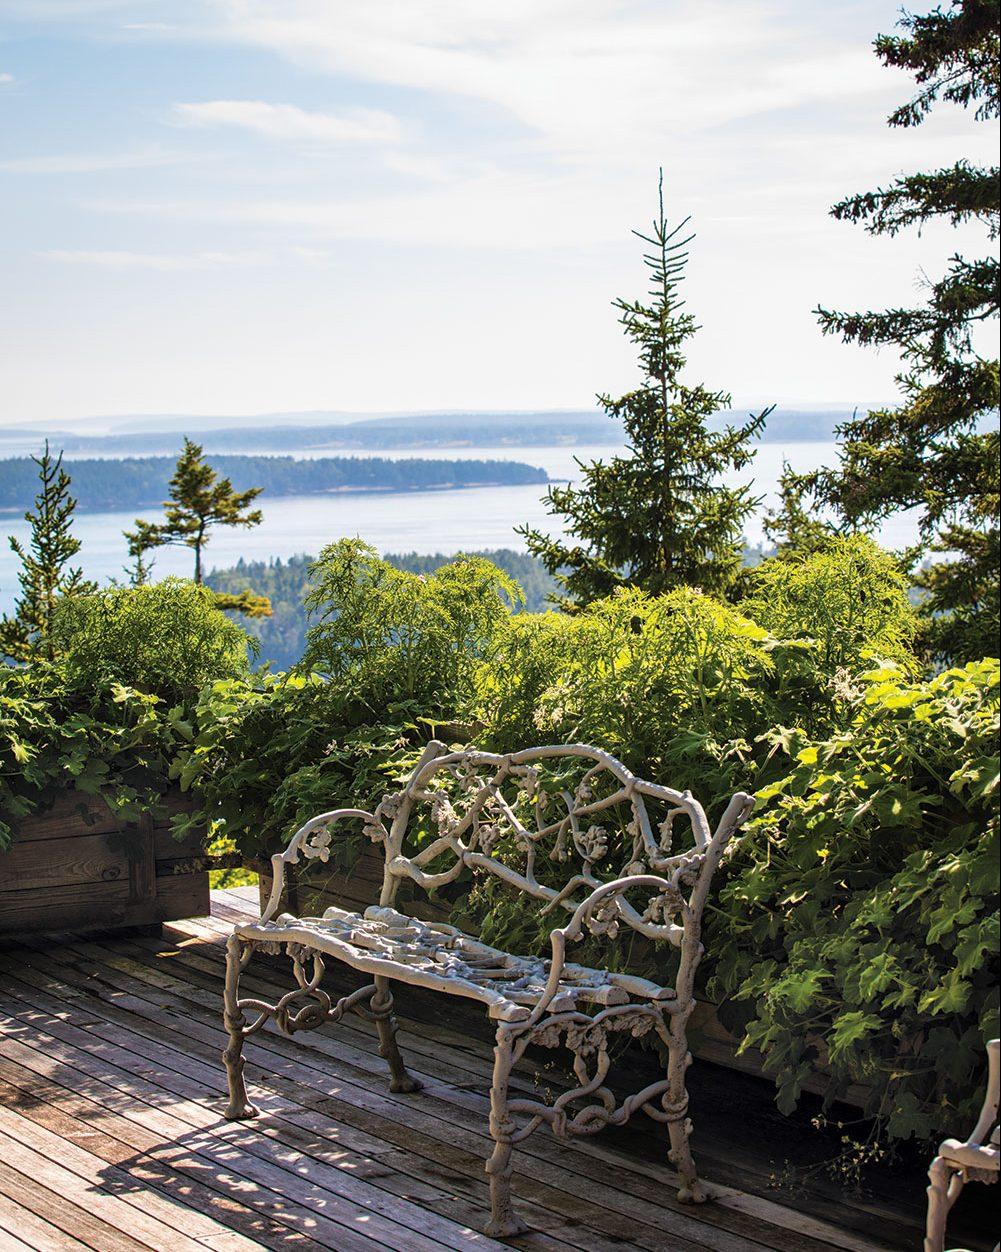 faux bois bench, vista